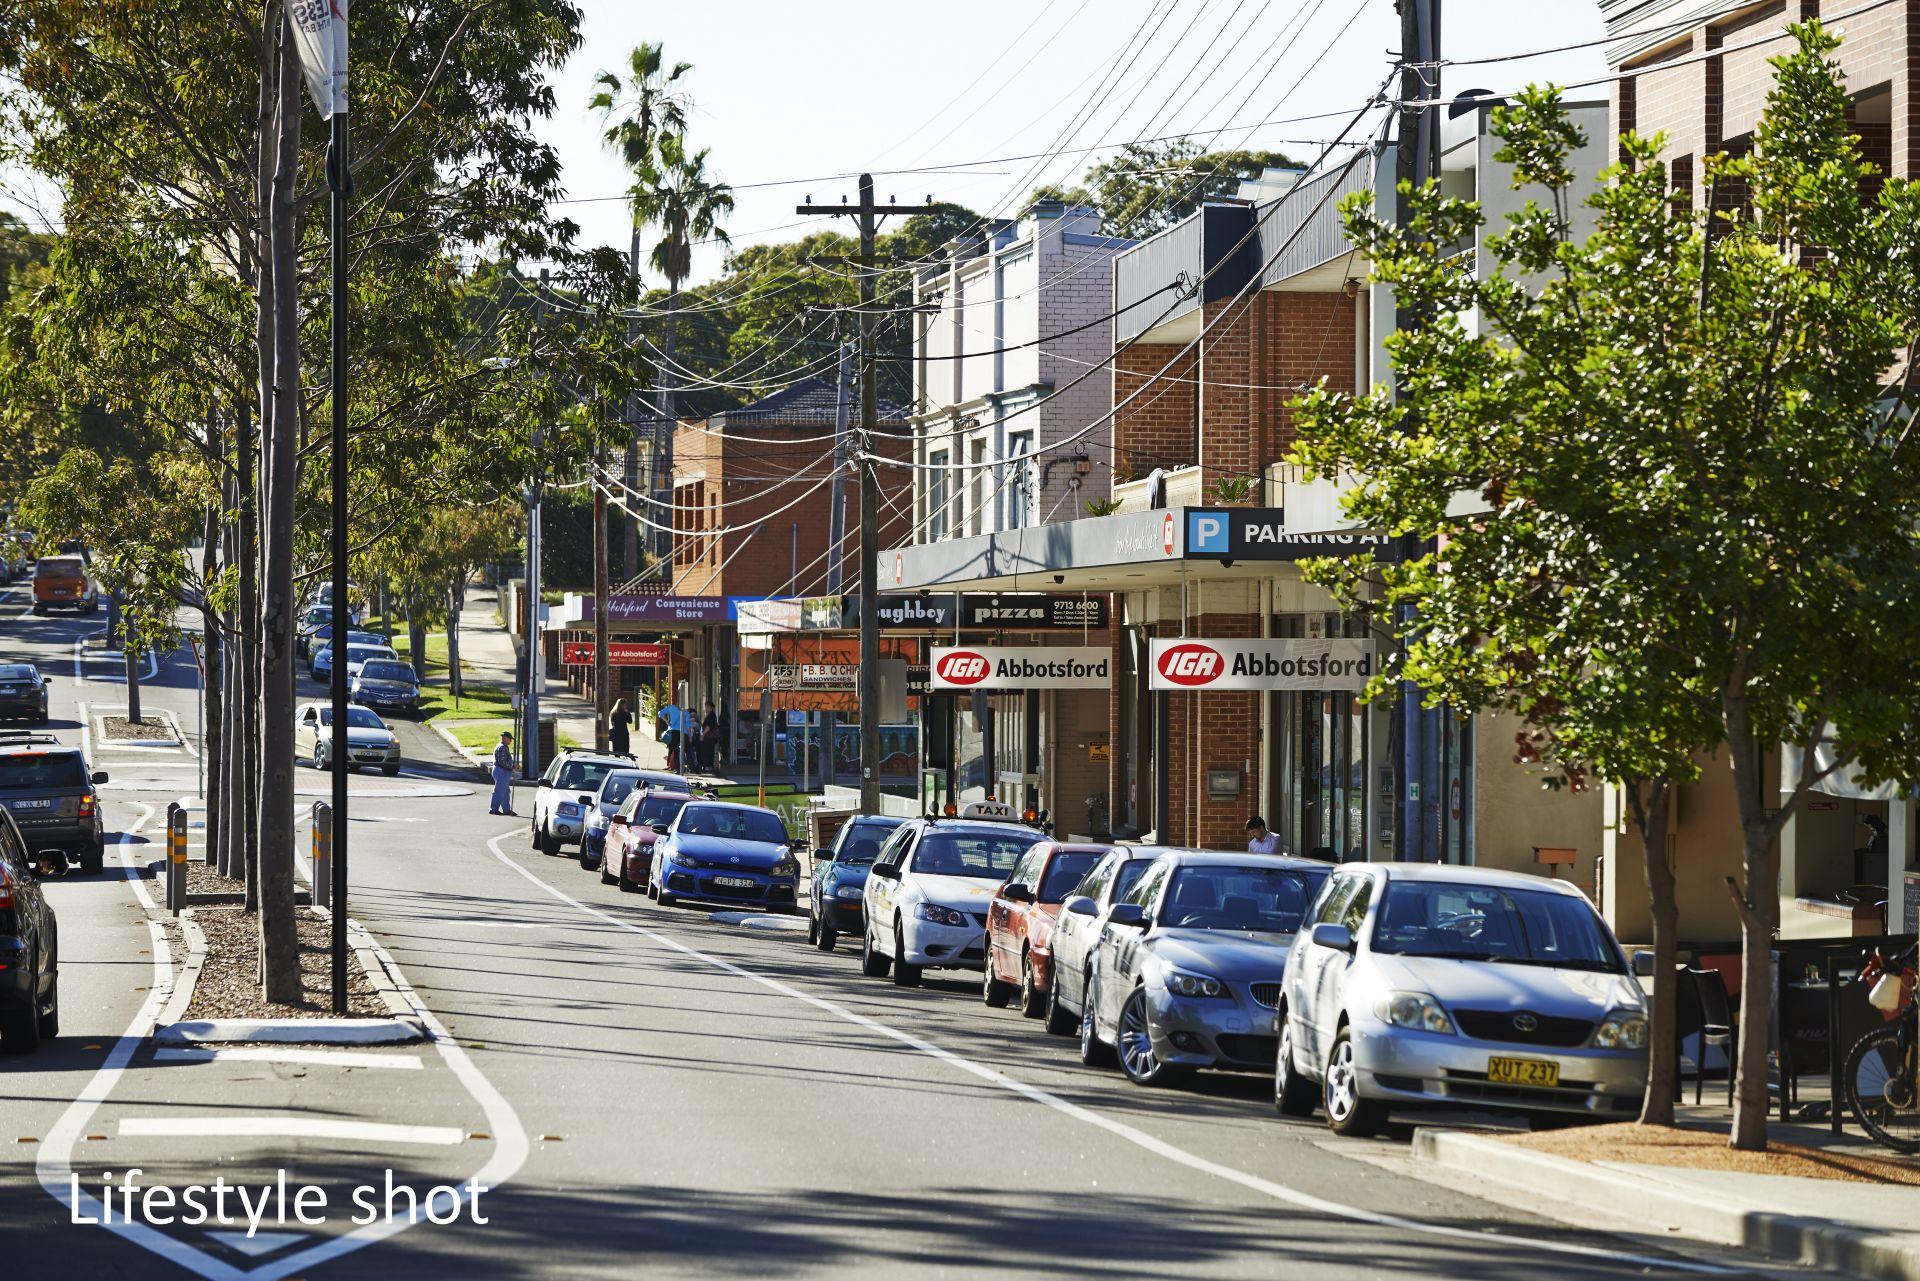 2/11 Abbotsford Parade, Abbotsford NSW